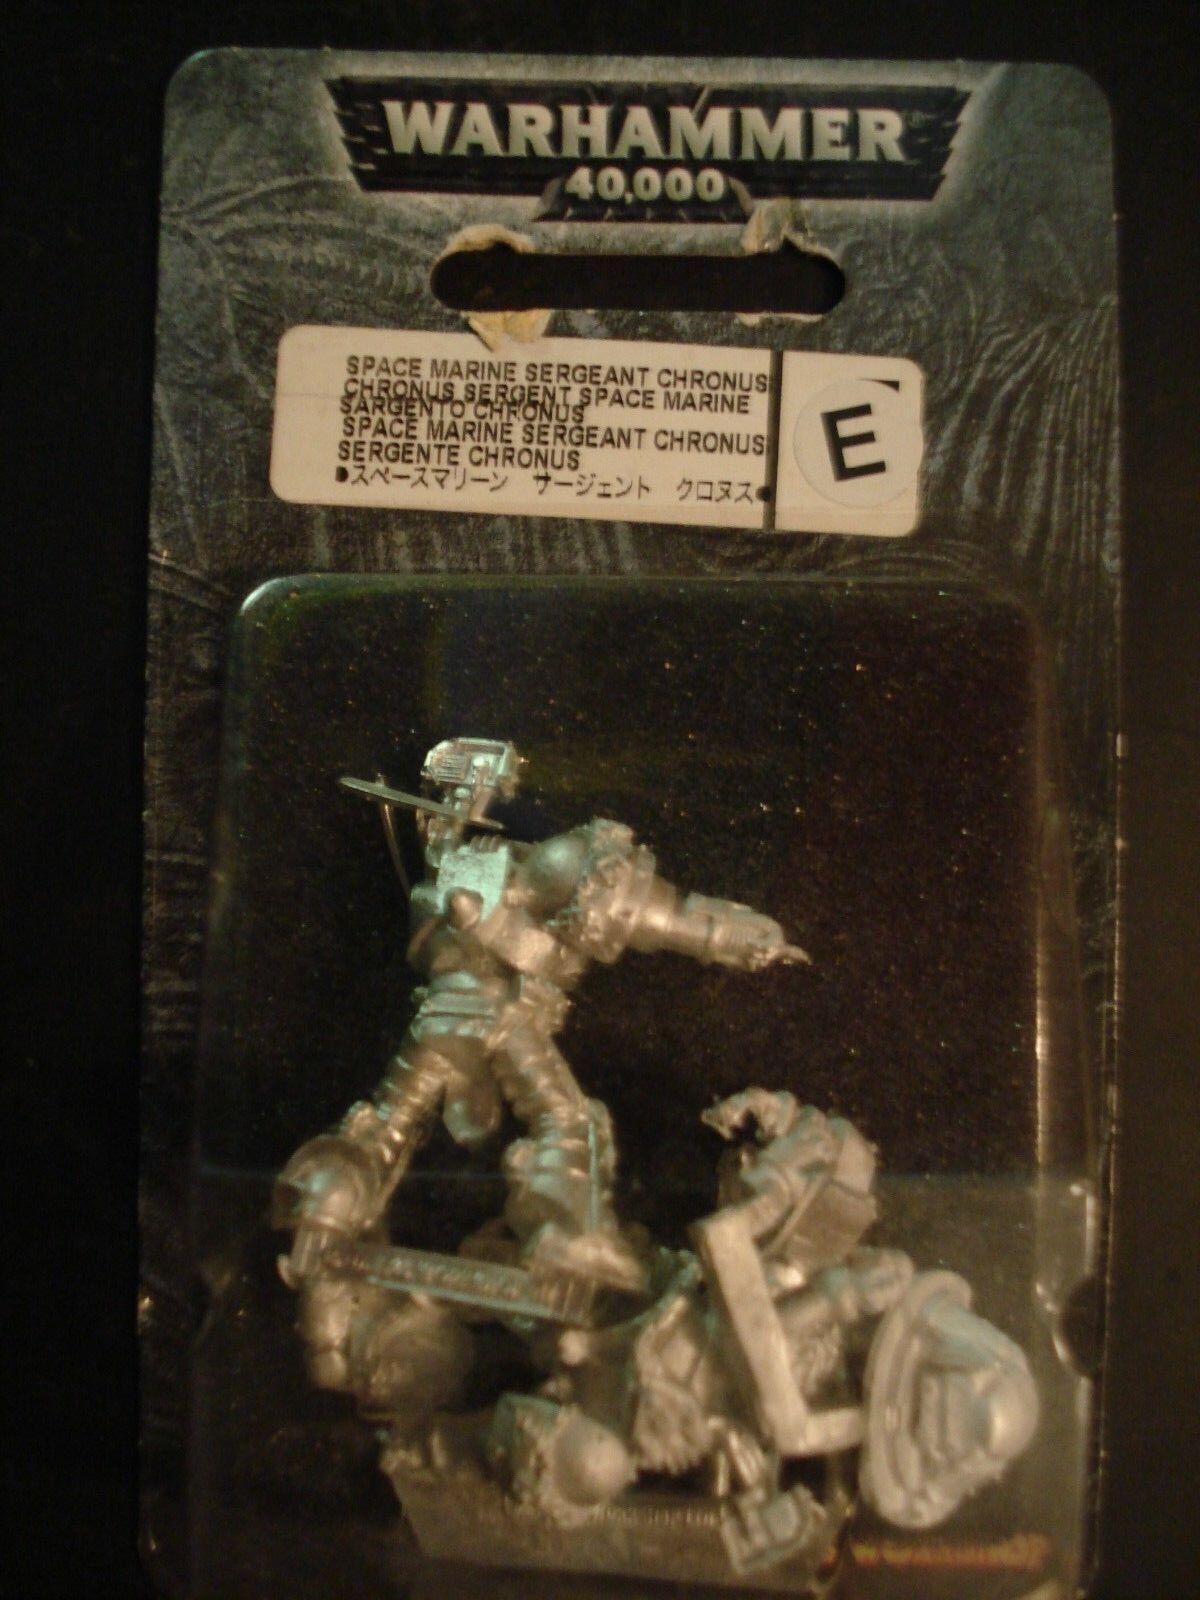 Warhammer 40k space marine ultramarin kommandanten sergeant chronus metall neue